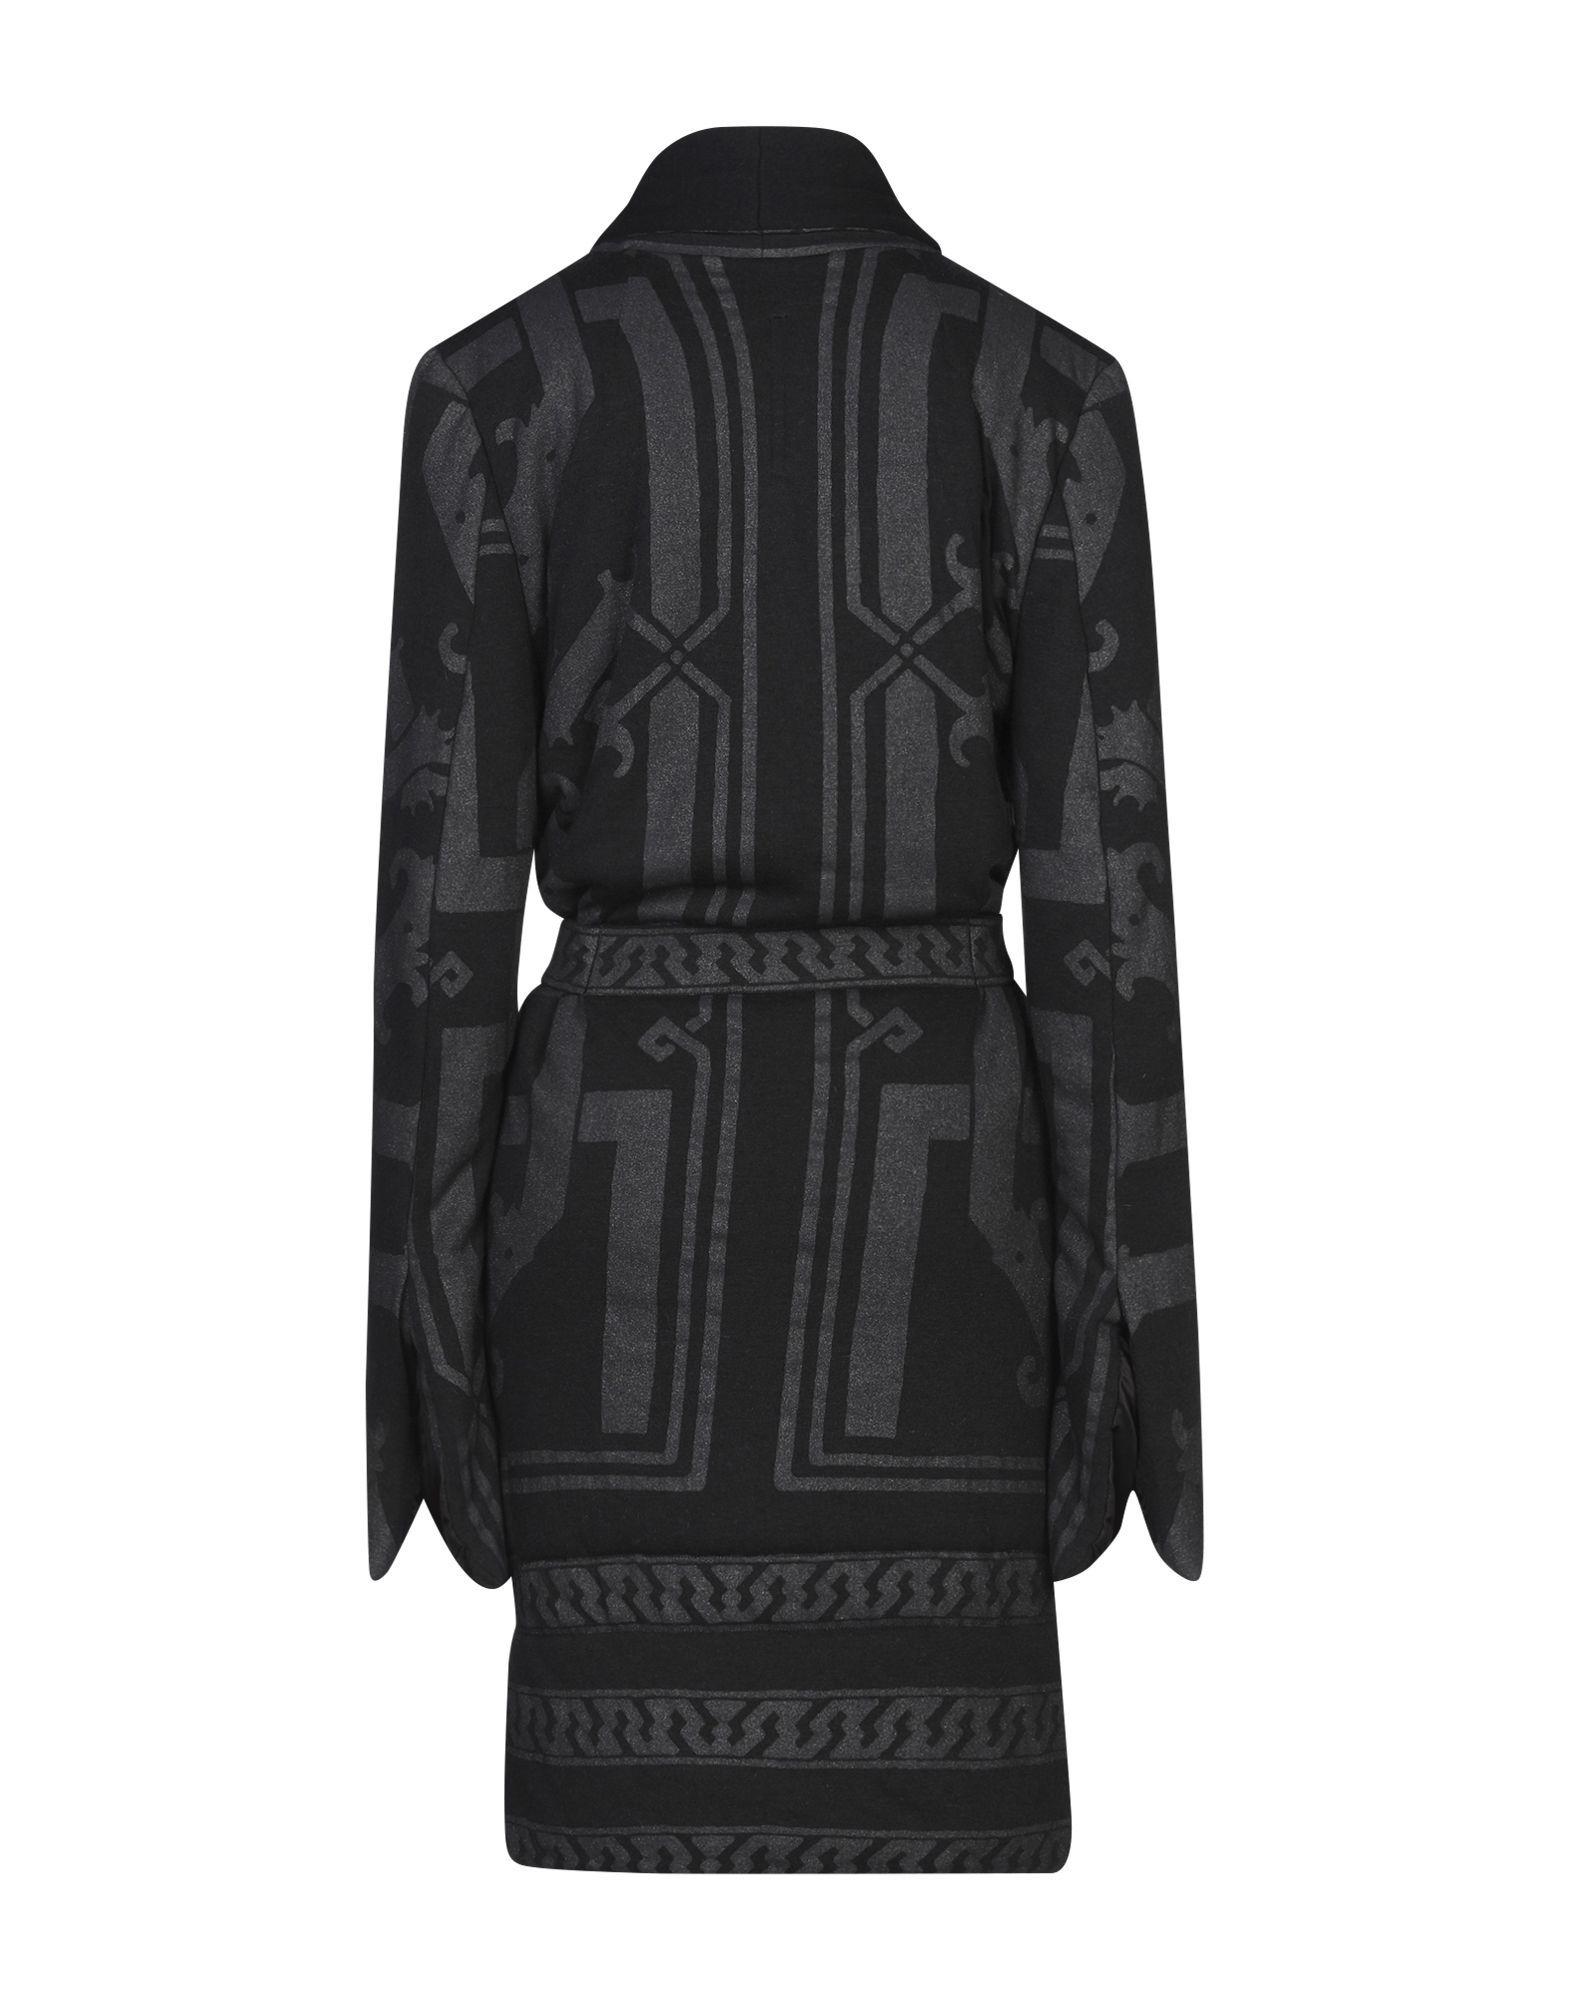 Rick Owens Lilies Black Belted Wrap Coat